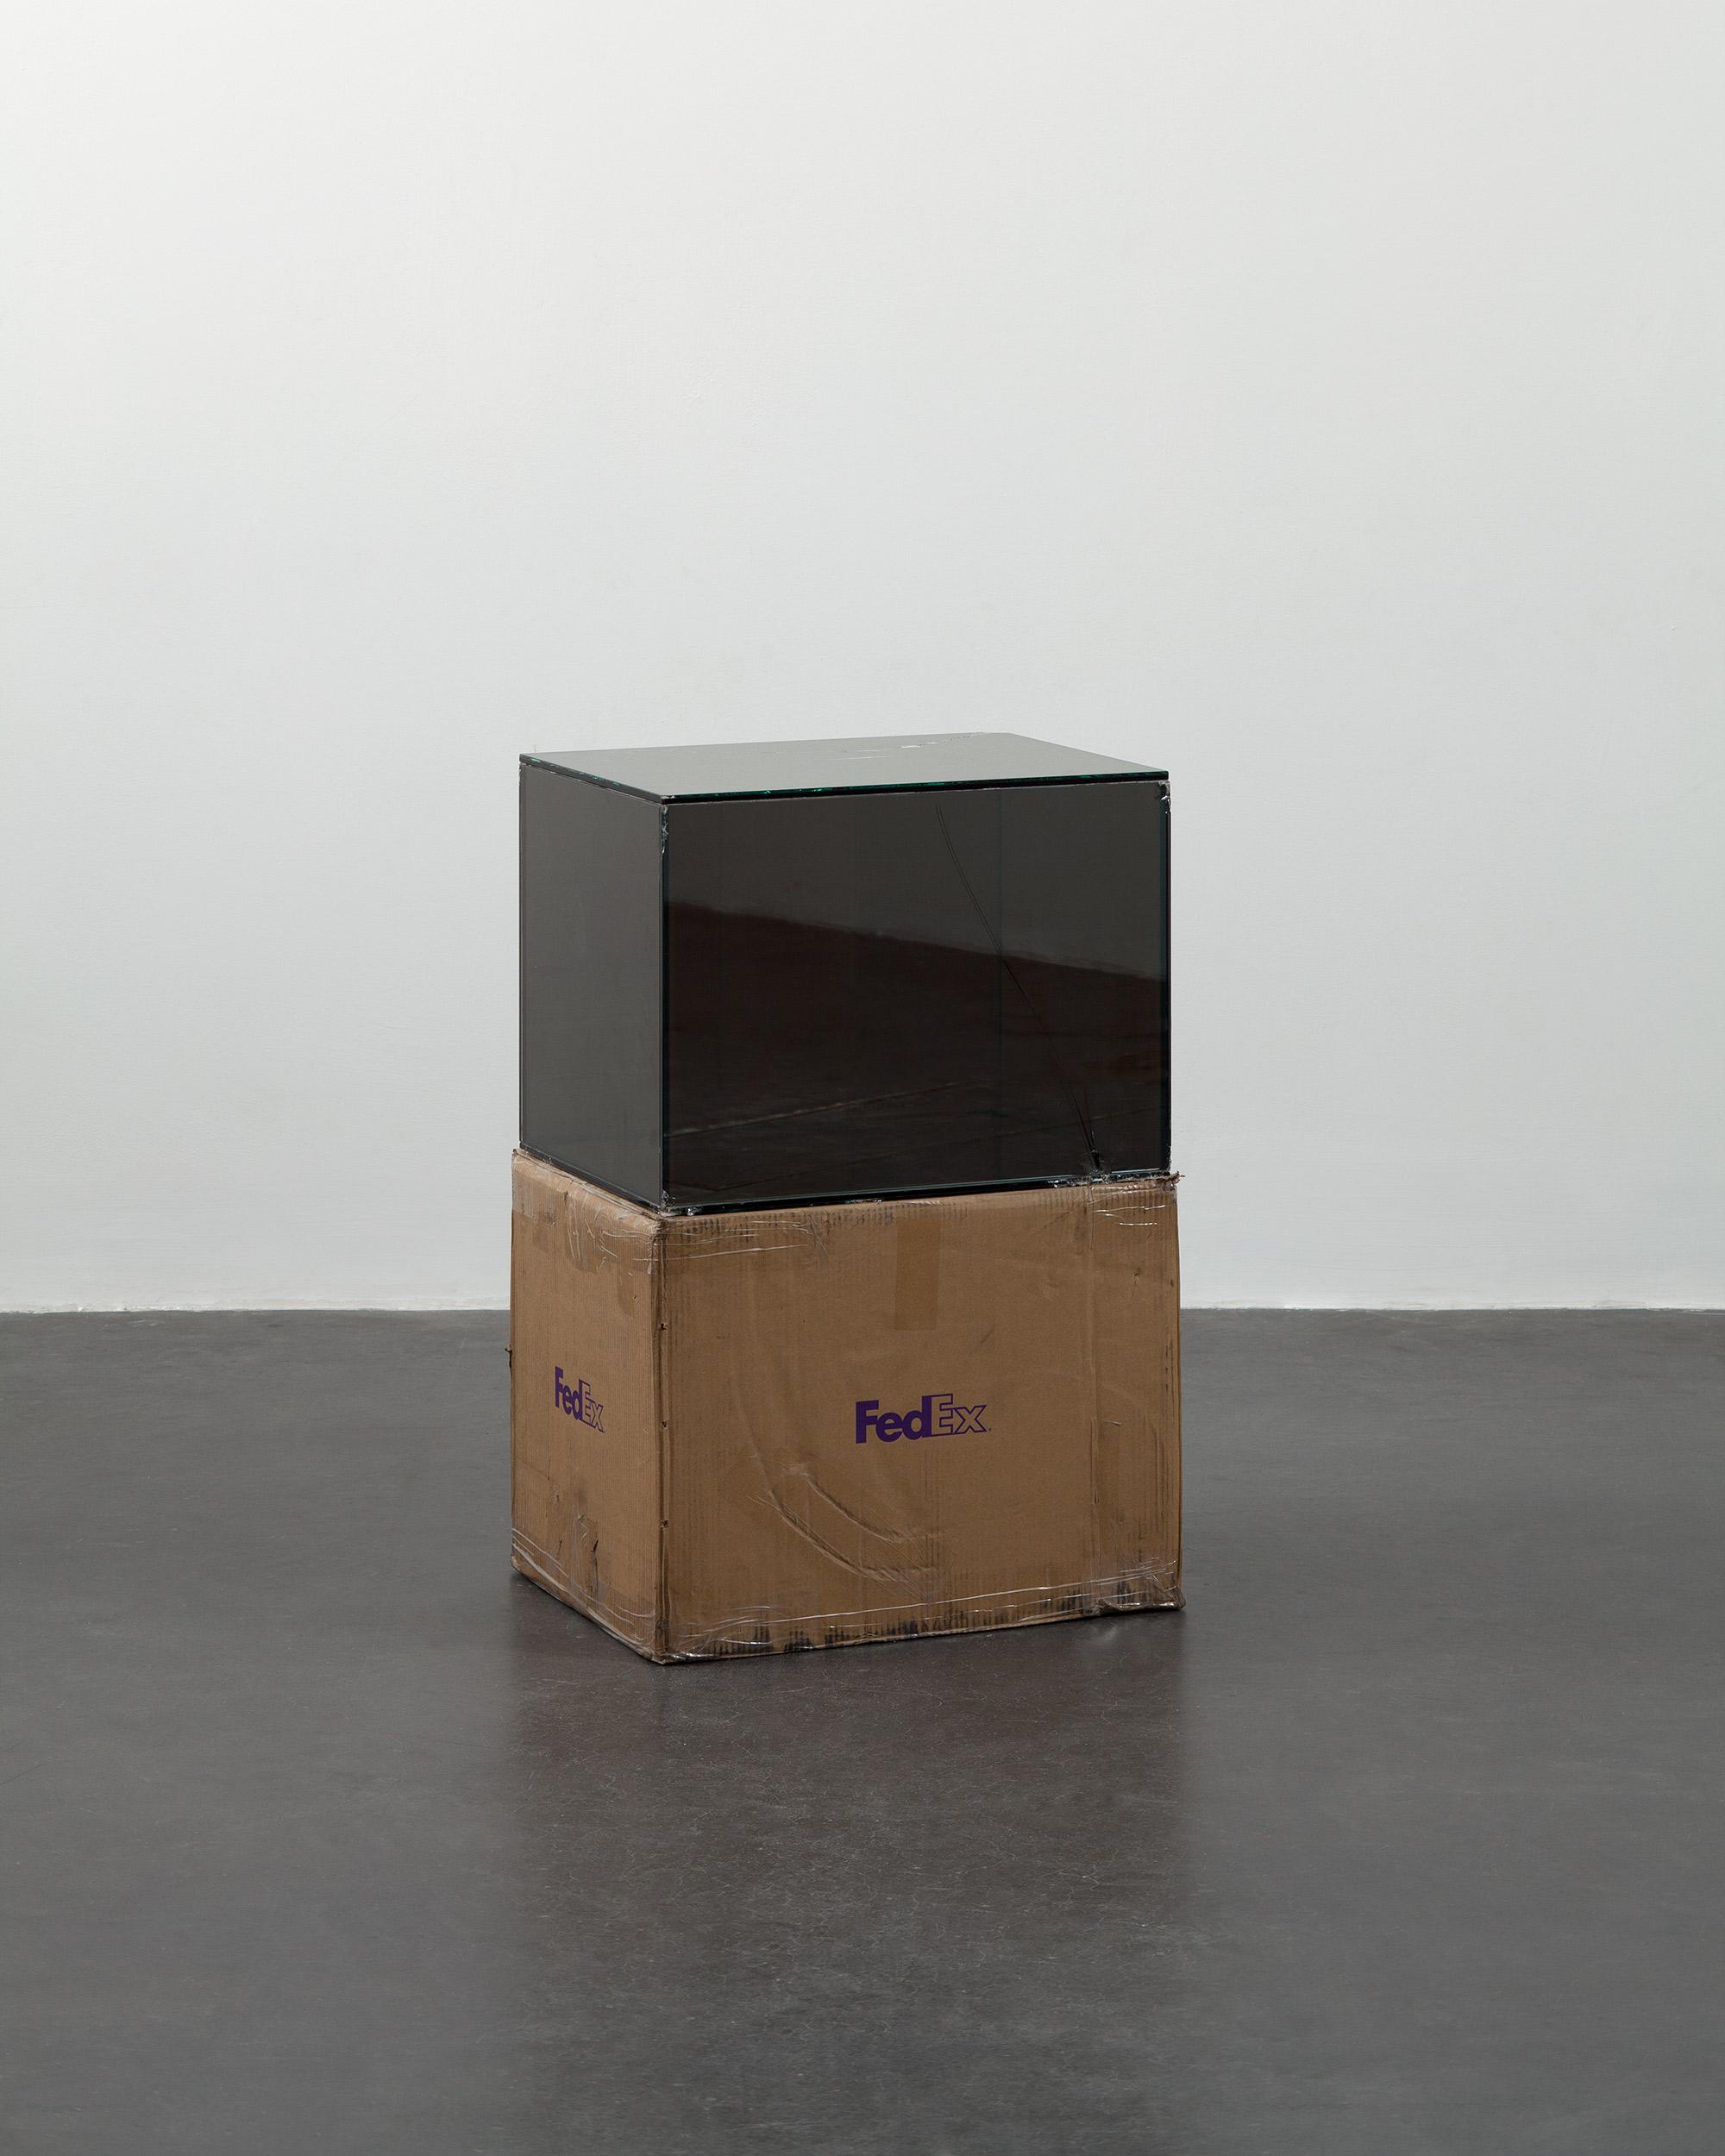 FedEx® Large Kraft Box  © 2004 FEDEX 155143 REV 10/04 SSCC, International Priority, Los Angeles–Beijing trk#875468976030, September 9–14, 2011, International Priority, Bejing–Paris trk#874594463967, March 13–15, 2012    2011–   Laminated Mirropane, FedEx shipping box, accrued FedEx shipping and tracking labels, silicone, metal, tape  23 5/8 x 18 1/2 x 18 1/2 inches   FedEx Glass Works, 2007–